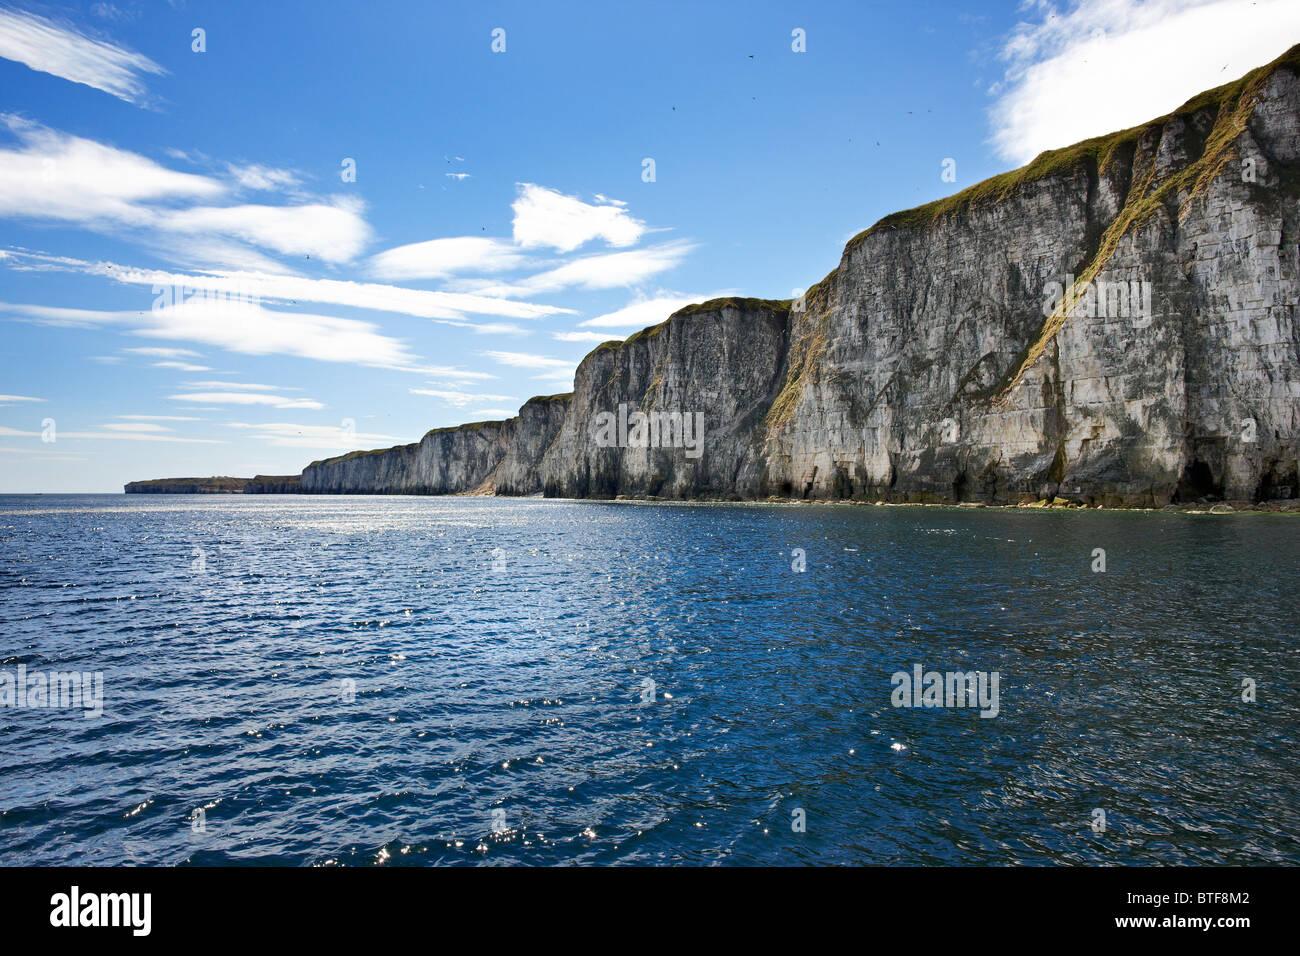 Chalk cliffs between Bempton and Flamborough, North Yorkshire coast. Summer. - Stock Image